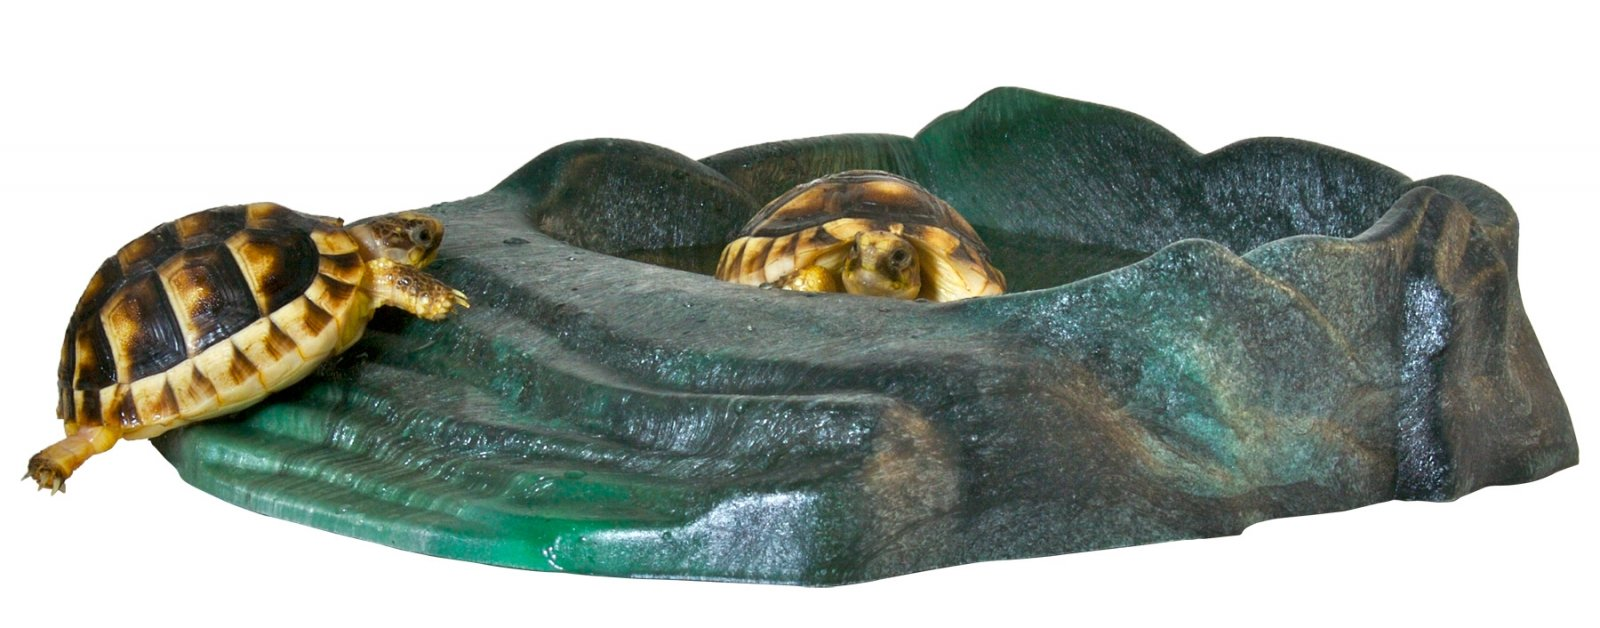 RRB-11-turtles